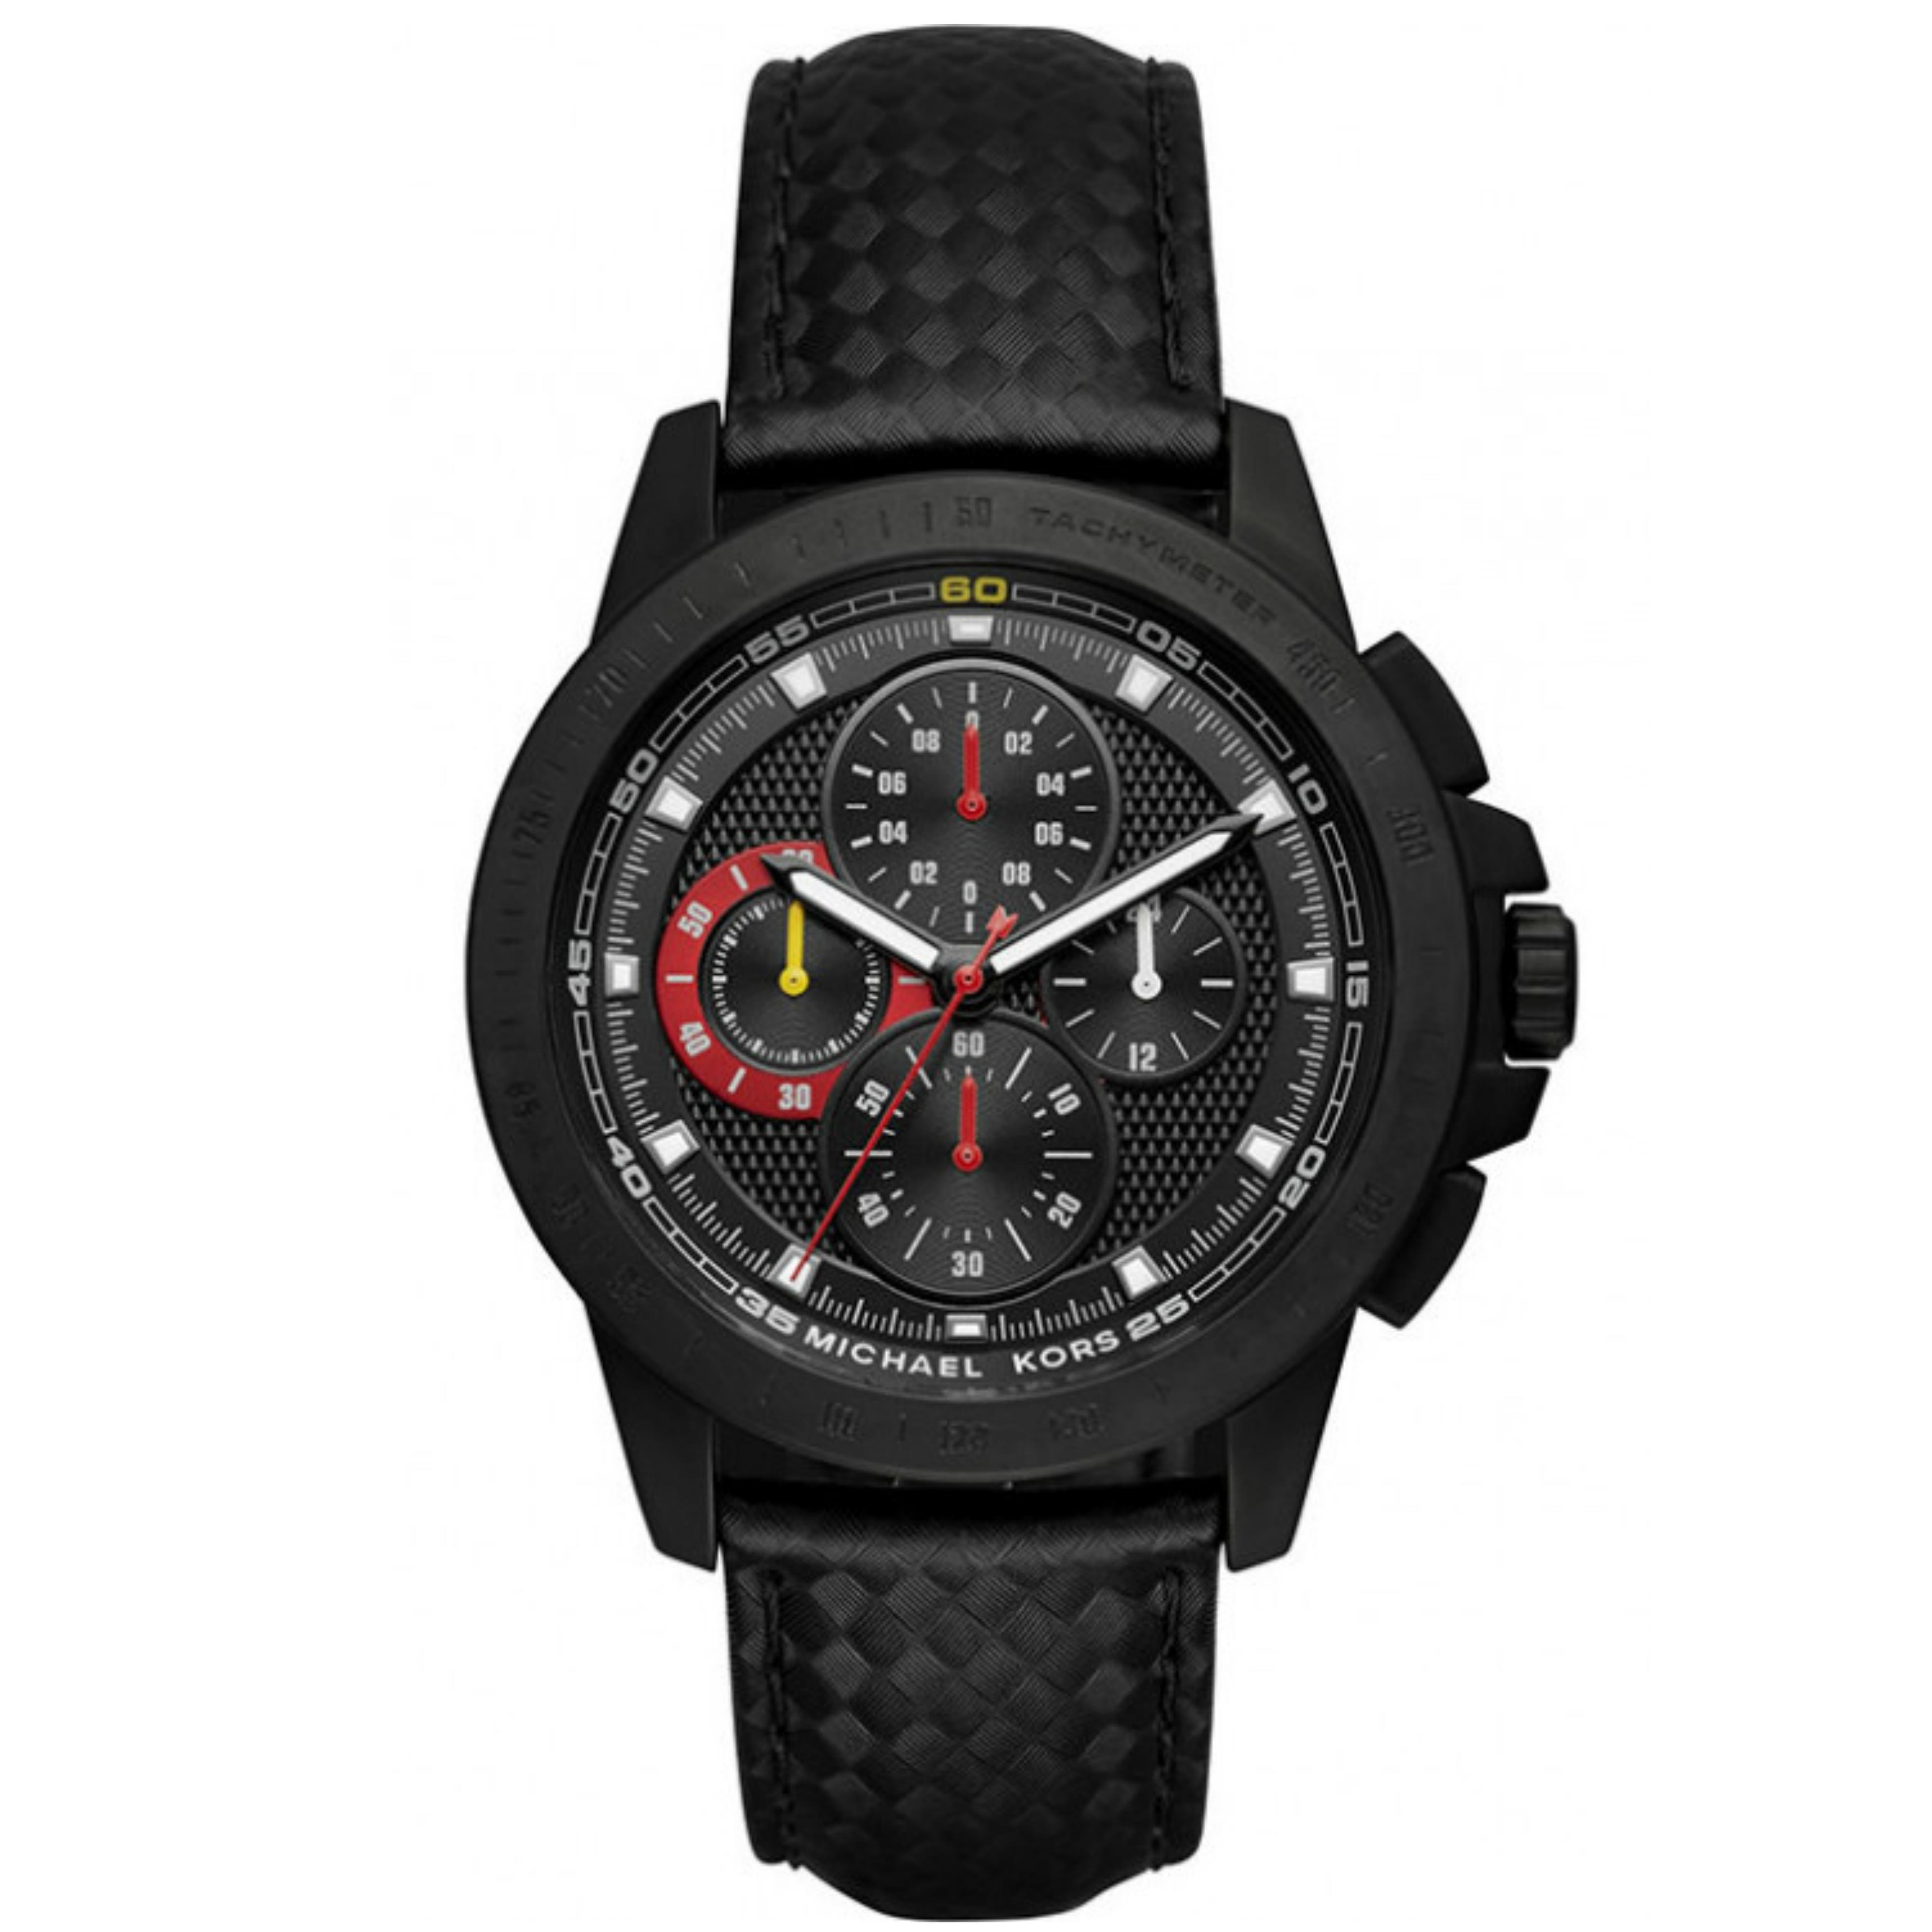 Michael Kors Ryker Men's Chronograph Black Leather Strap Round Dial Watch MK8521